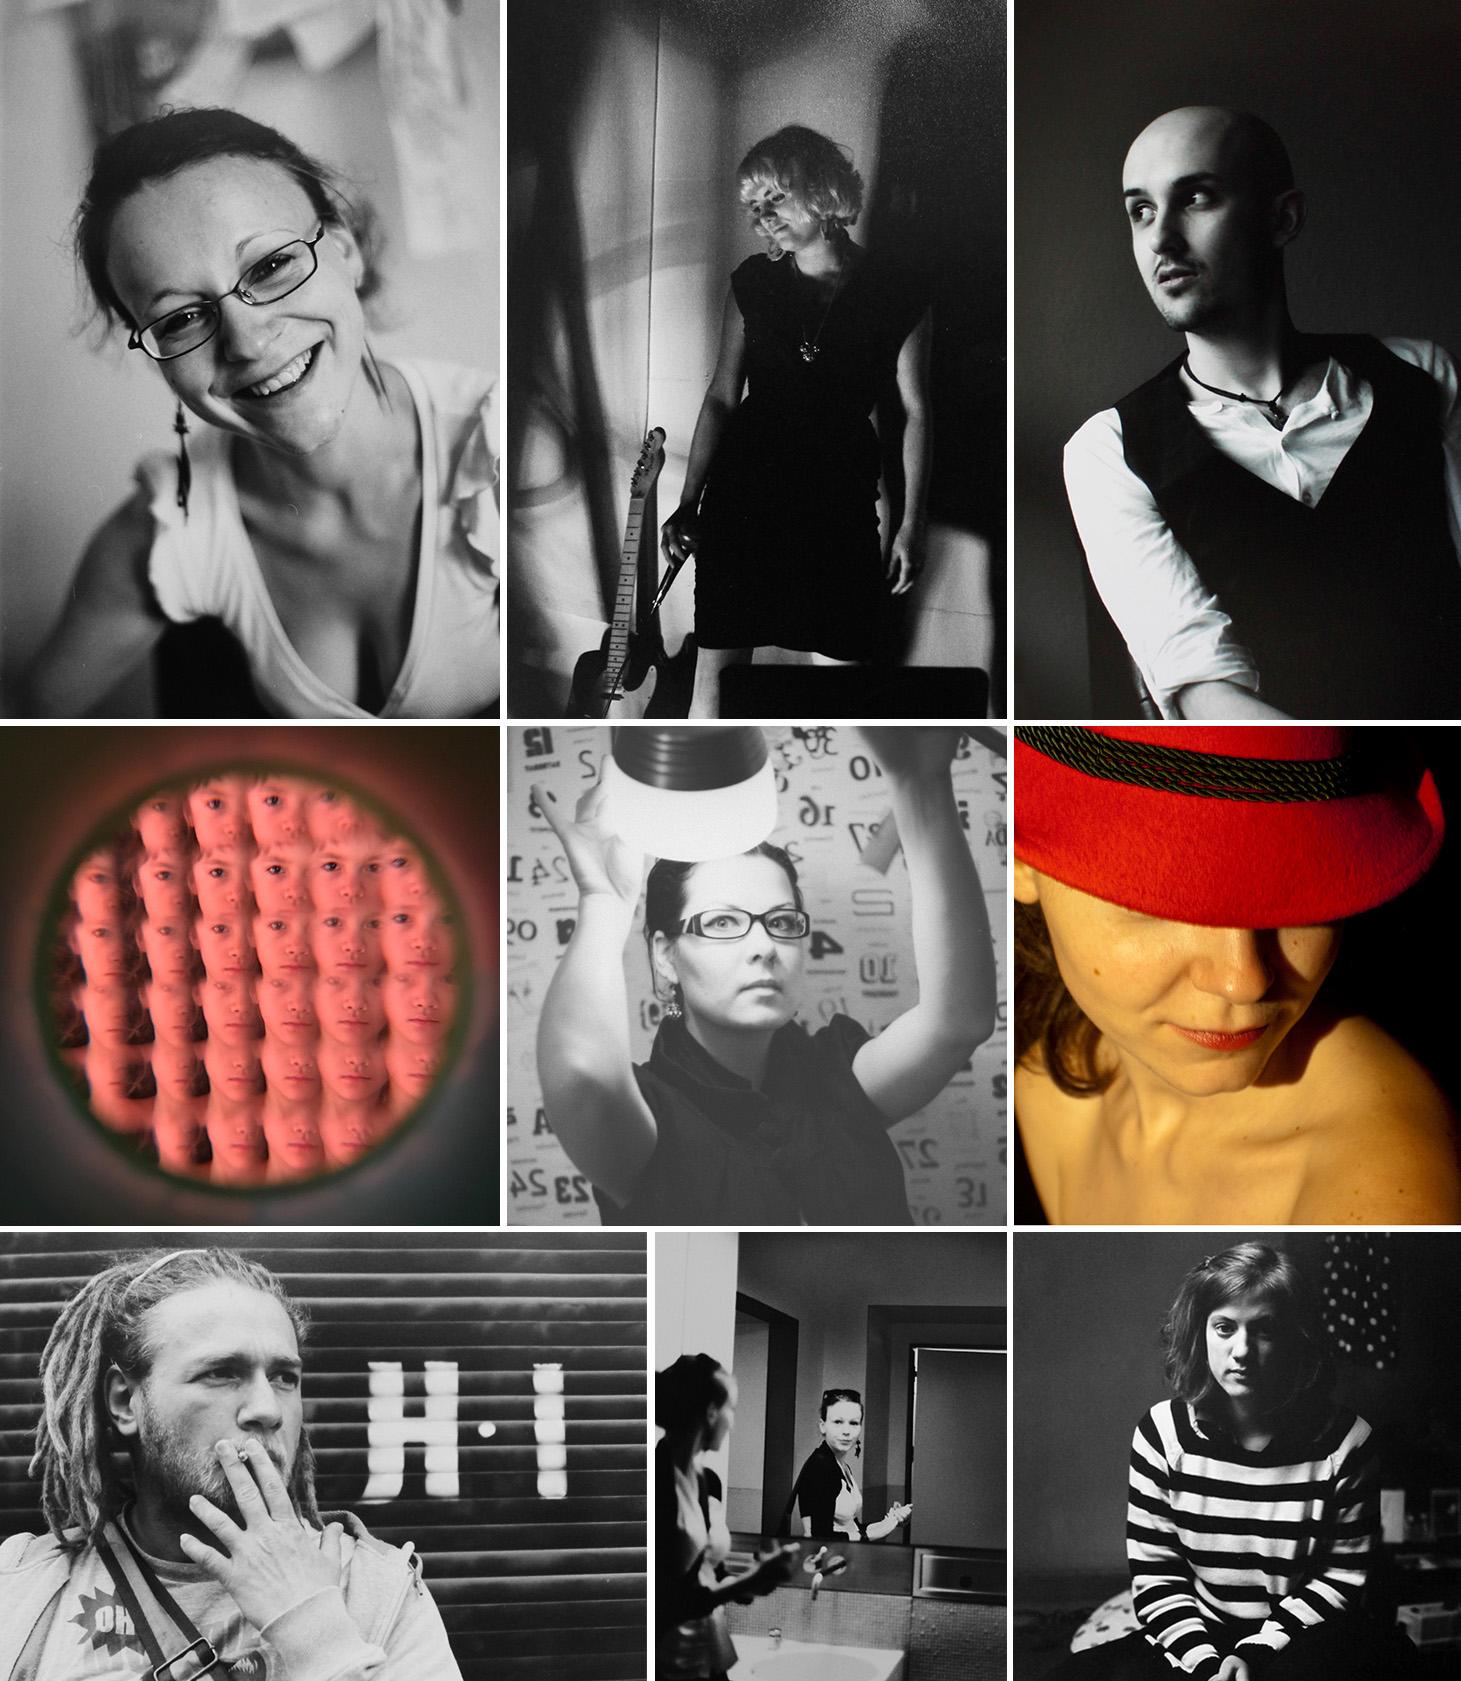 Fotografie: Portraits